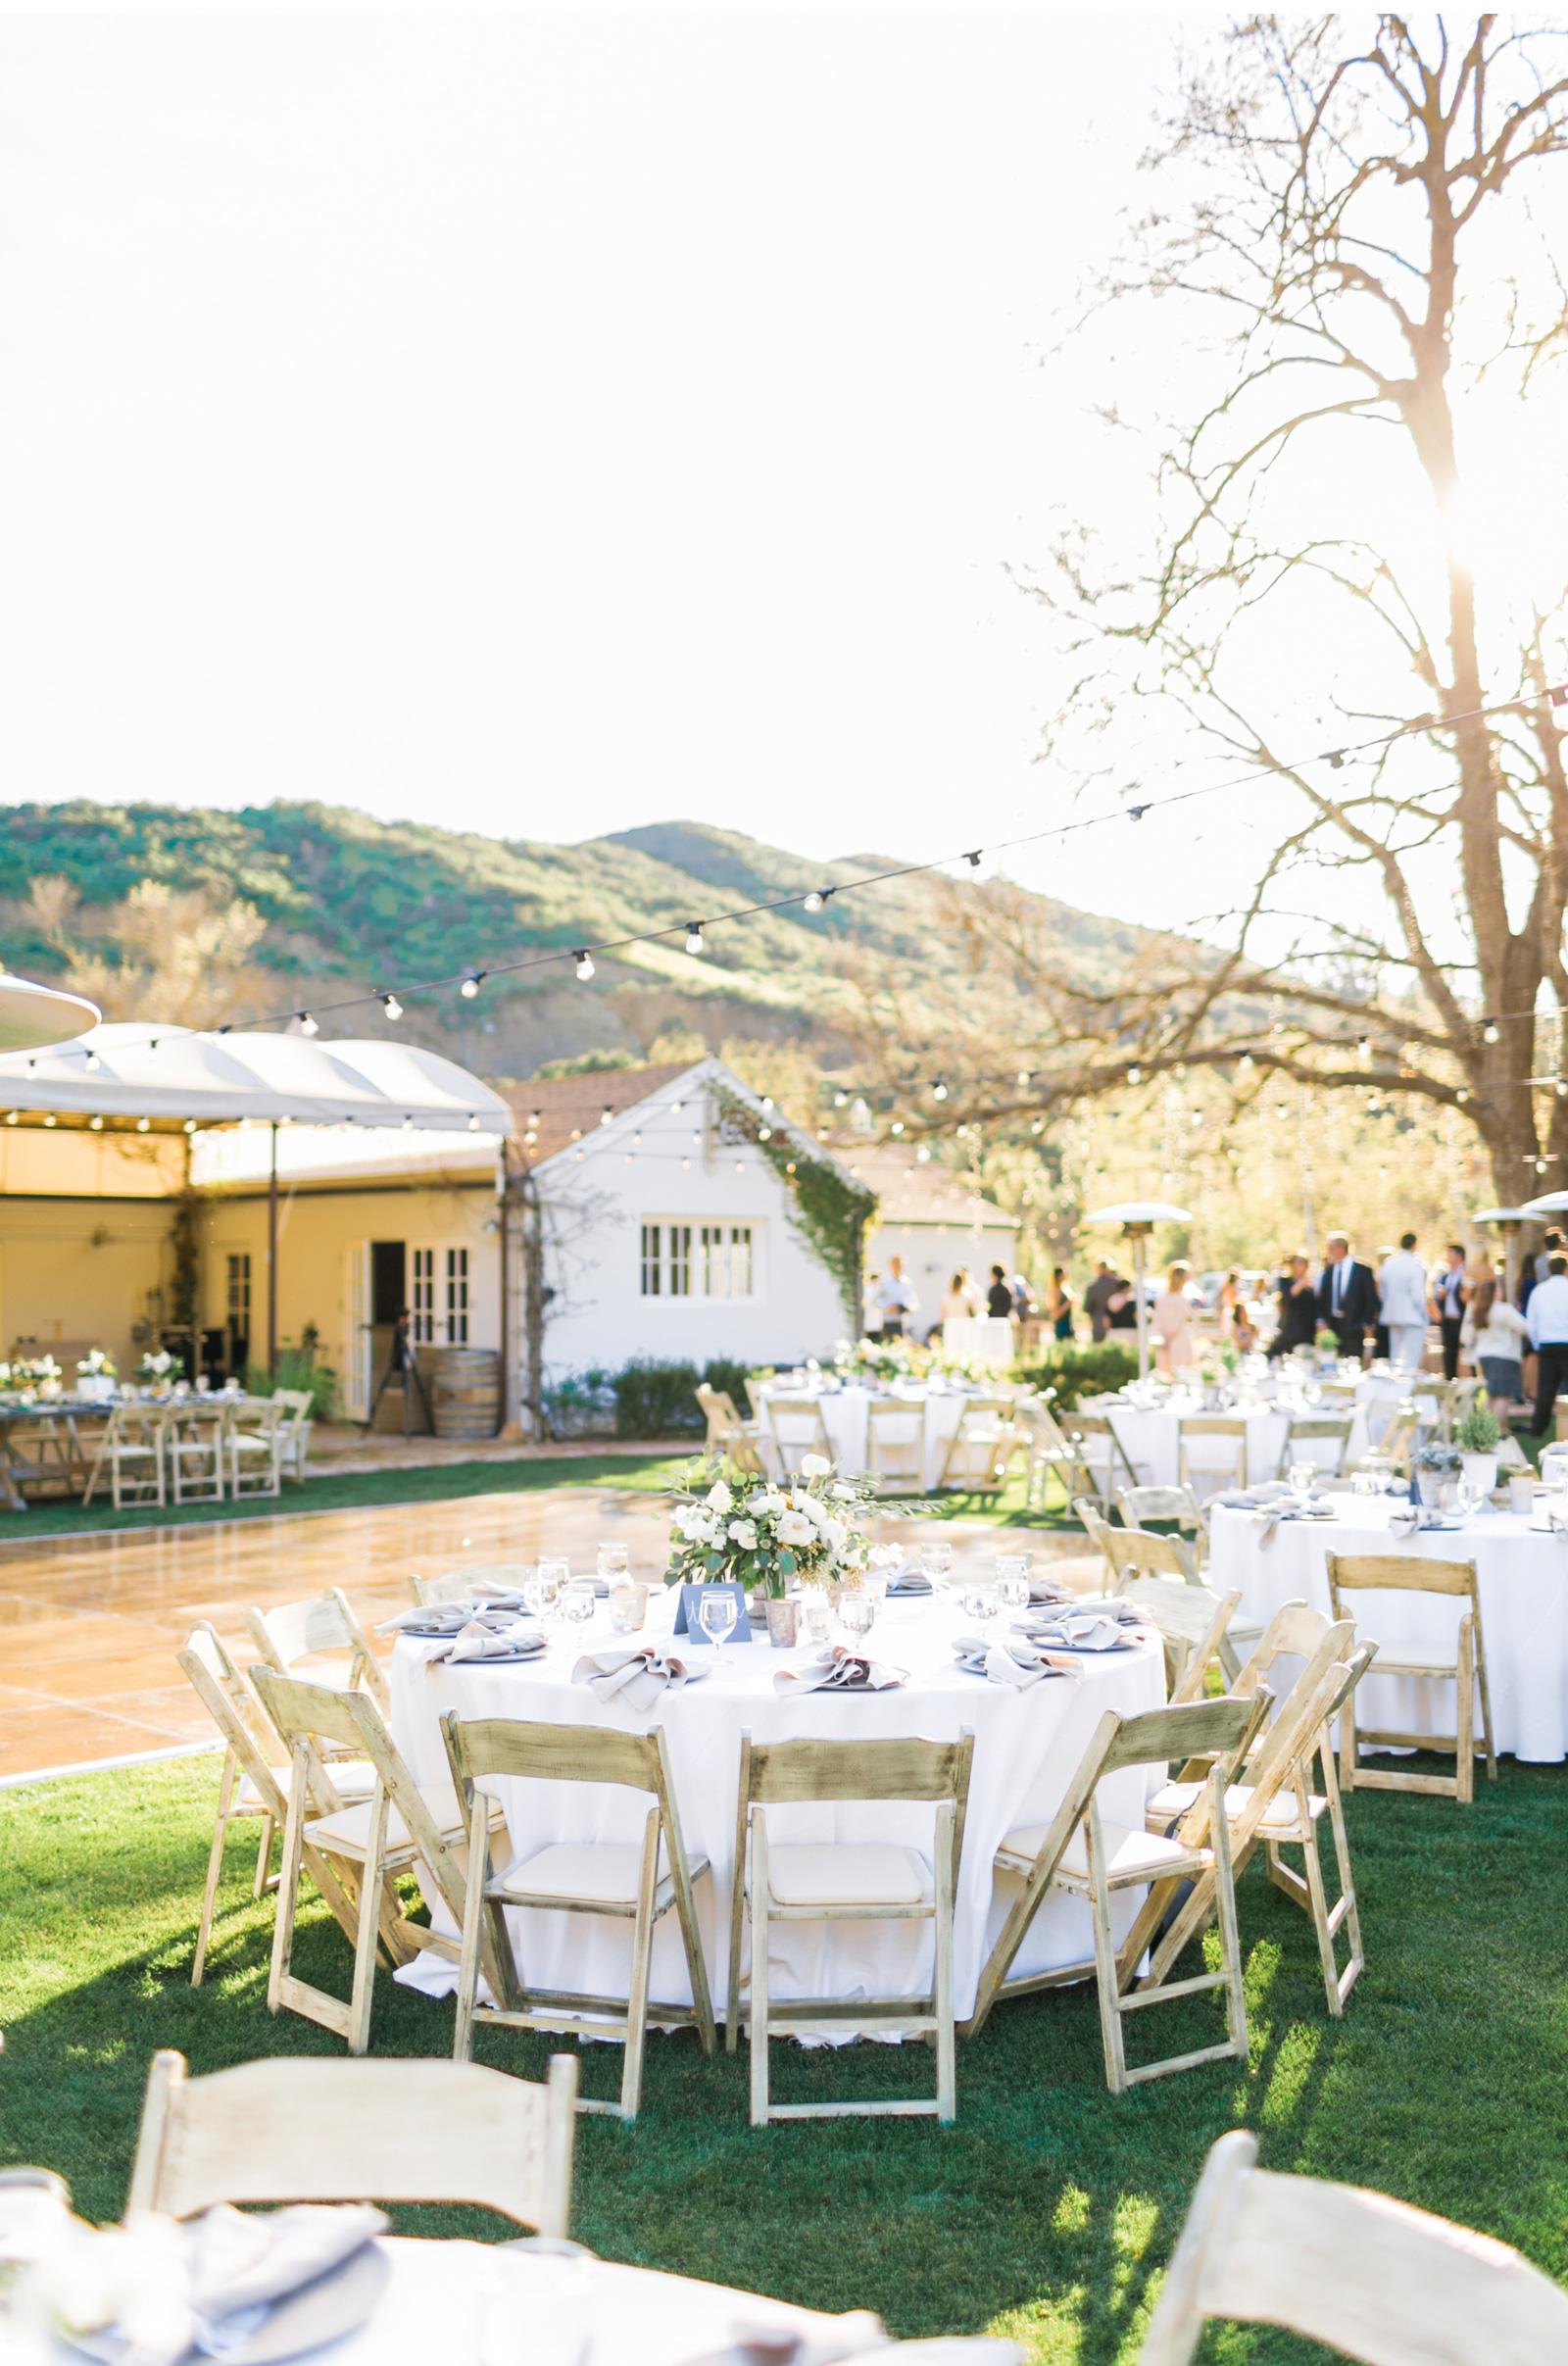 Triunfo-Creek-Malibu-Wedding-Natalie-Schutt-Photography-Couture-Events-Style-Me-Pretty_11.jpg